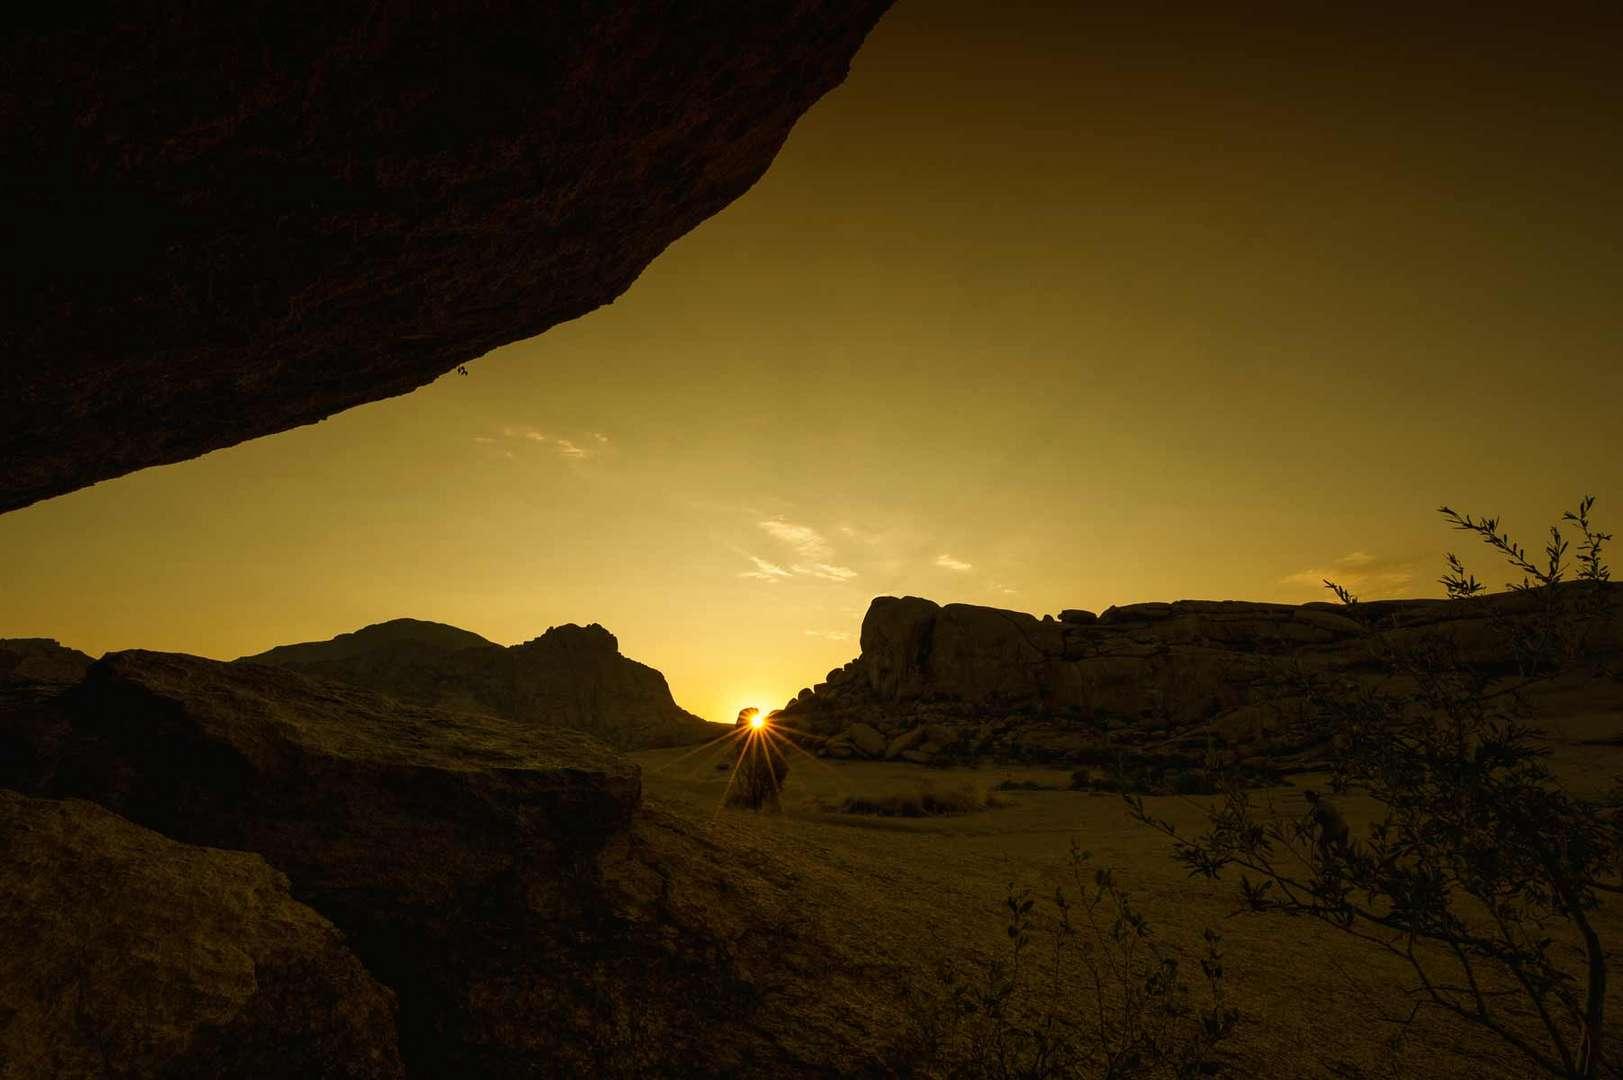 Sonnenaufgang im Erongo Gebirge